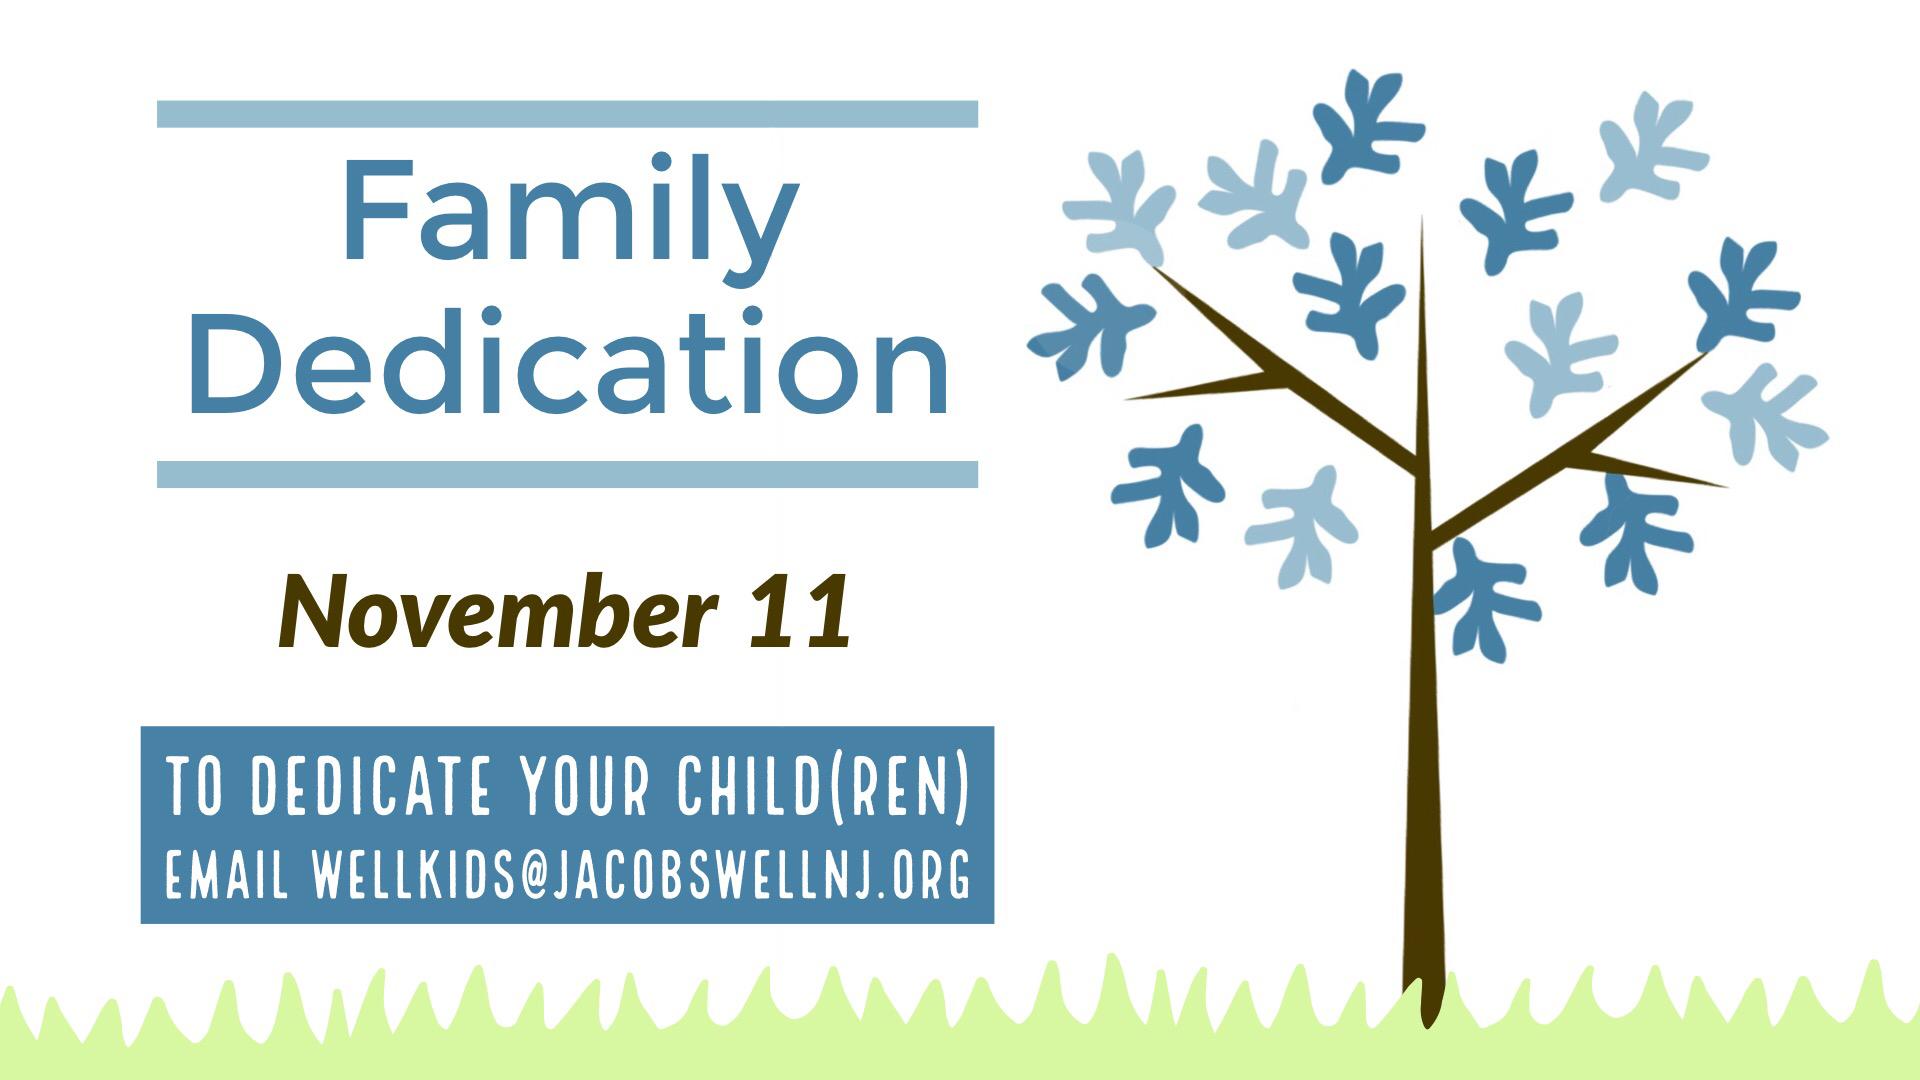 Family Dedication Fall 2018 image